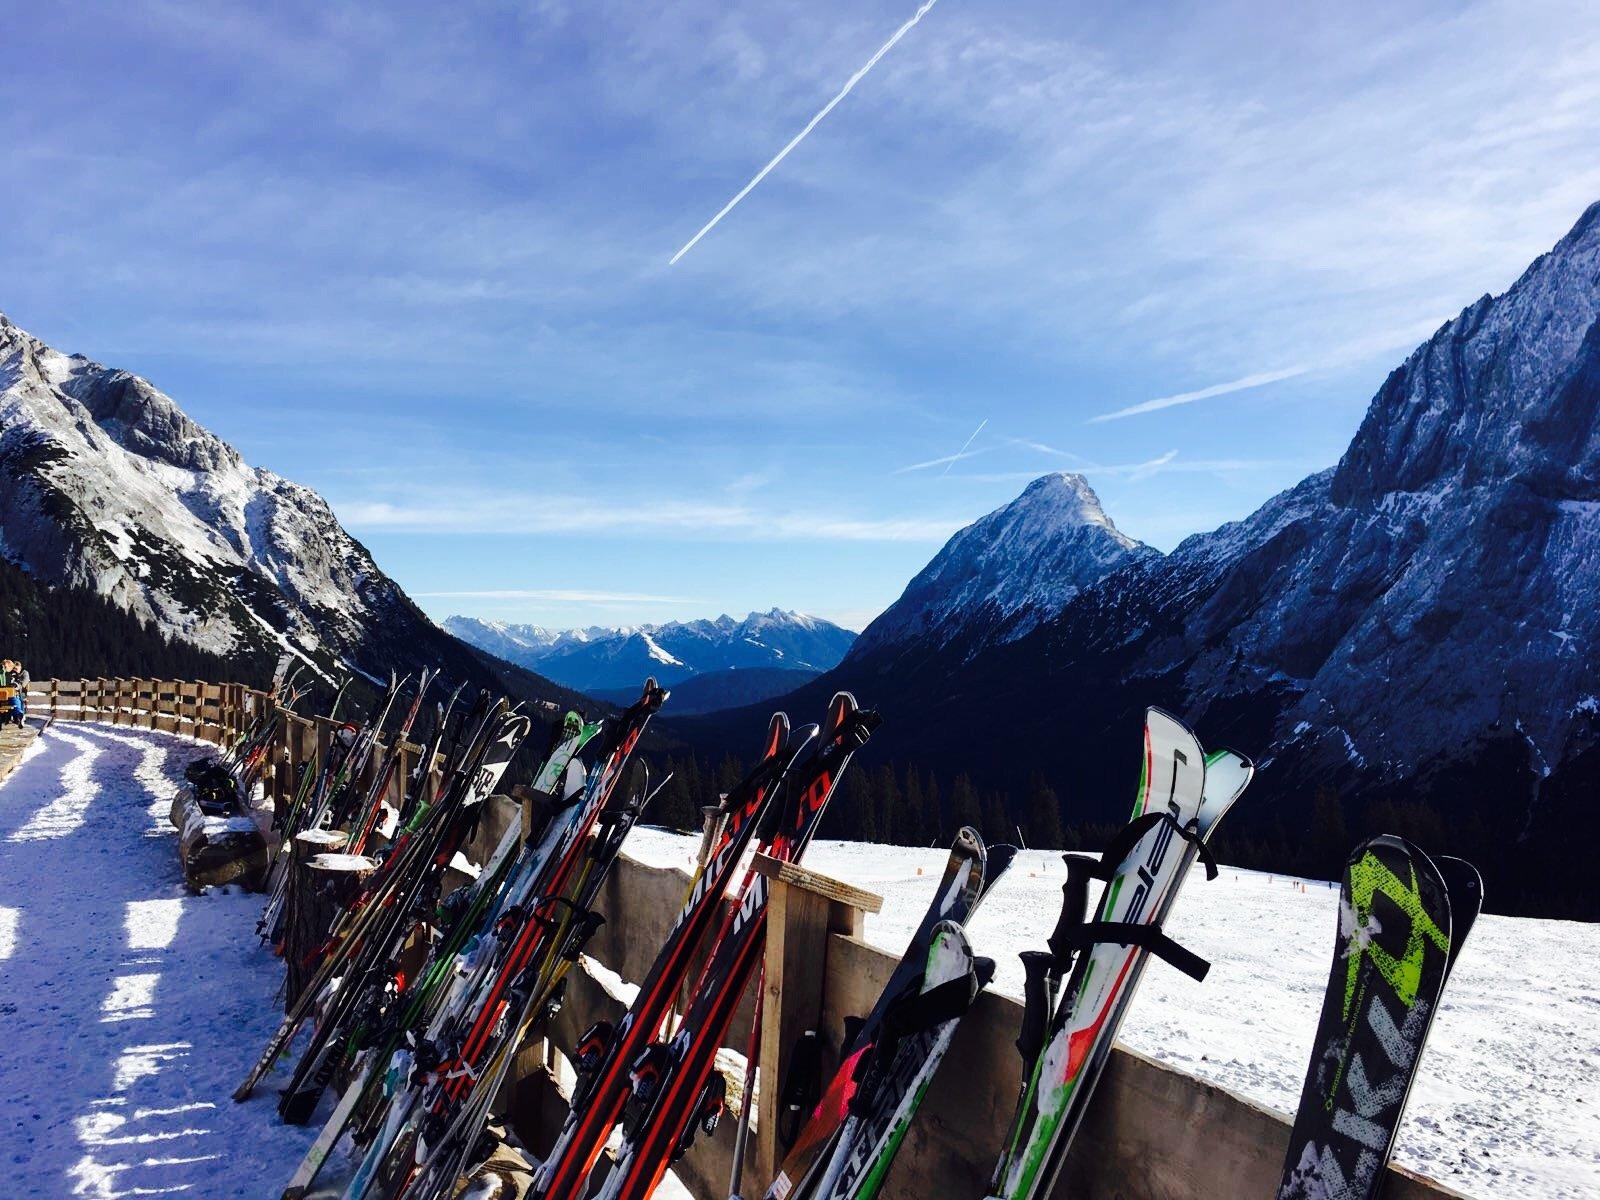 Berwang ski piste